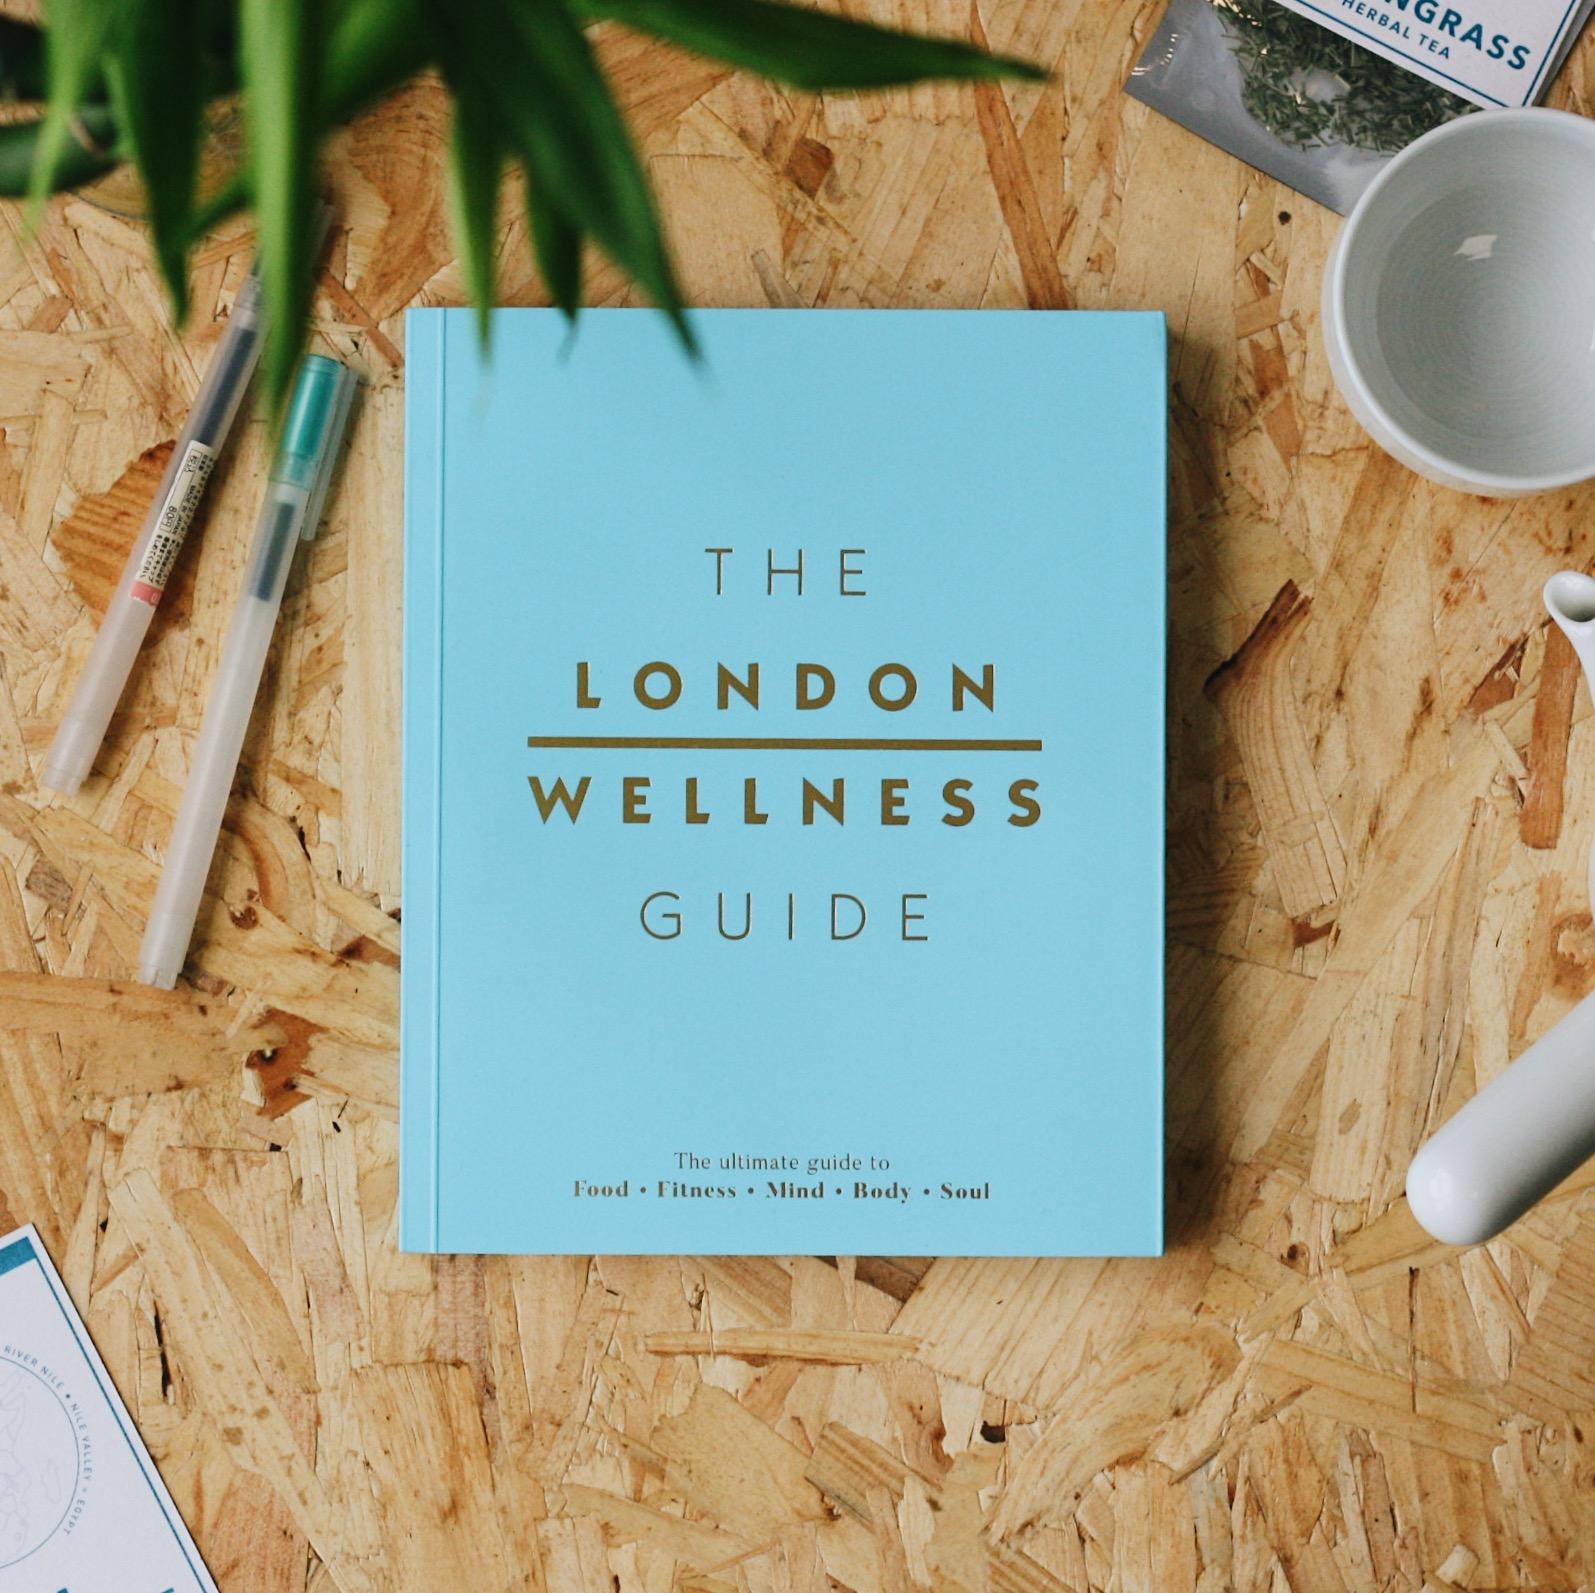 London_wellness_guide